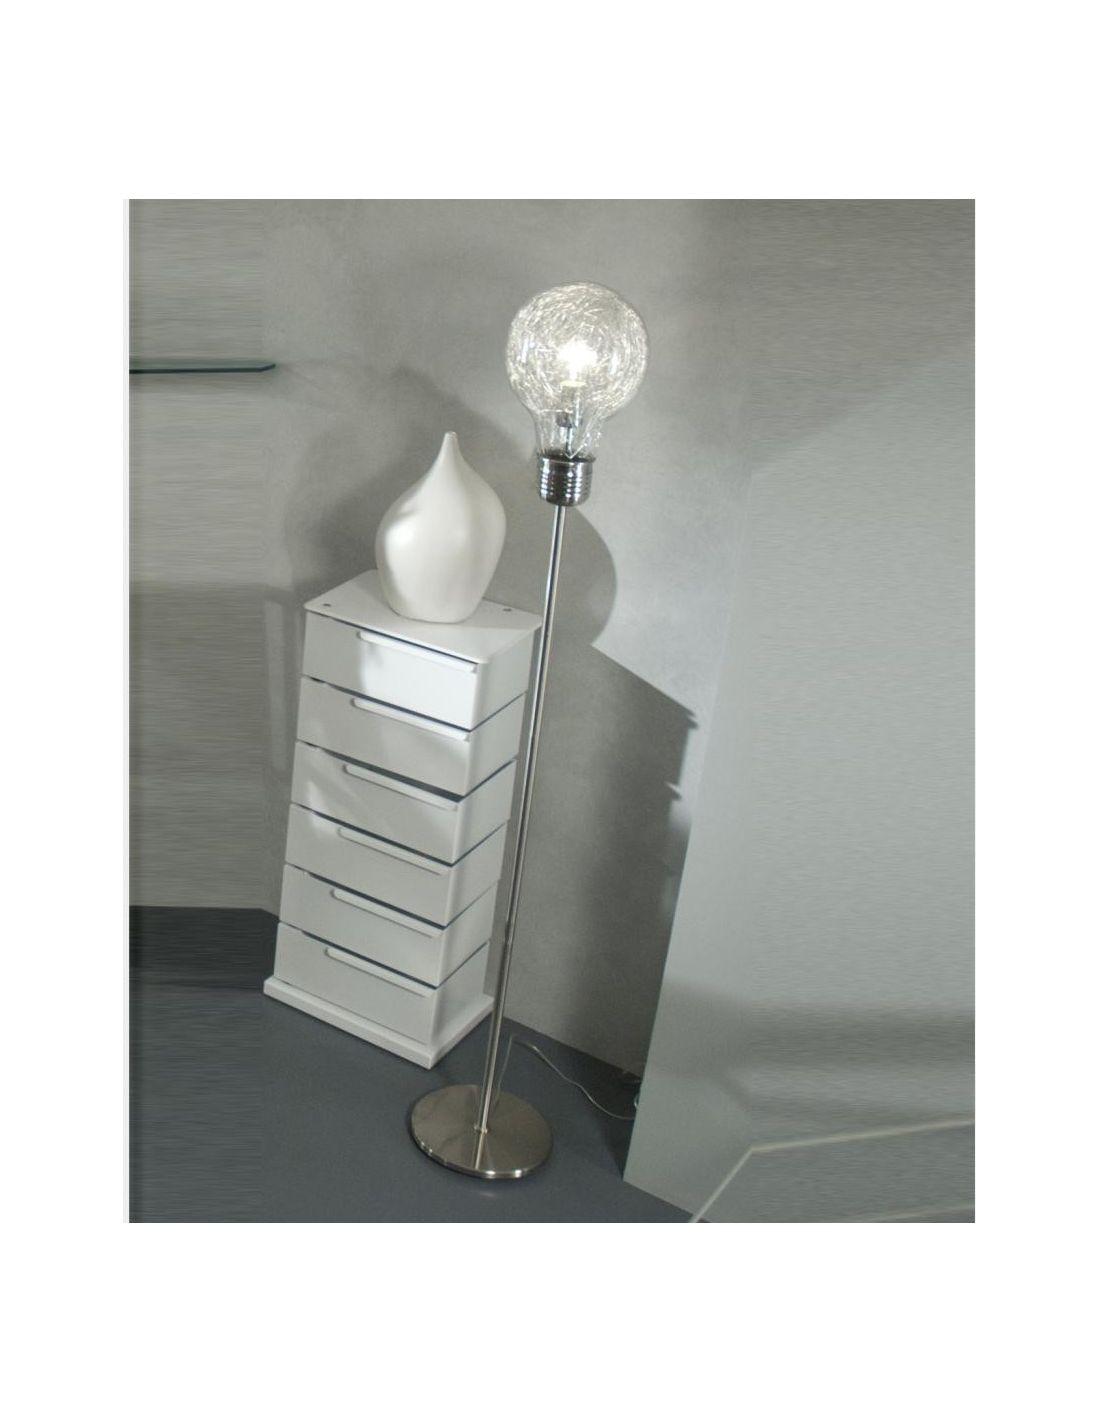 Lampada piantana gwenda da terra in metallo e vetro 160 cm for Lampada piantana ikea